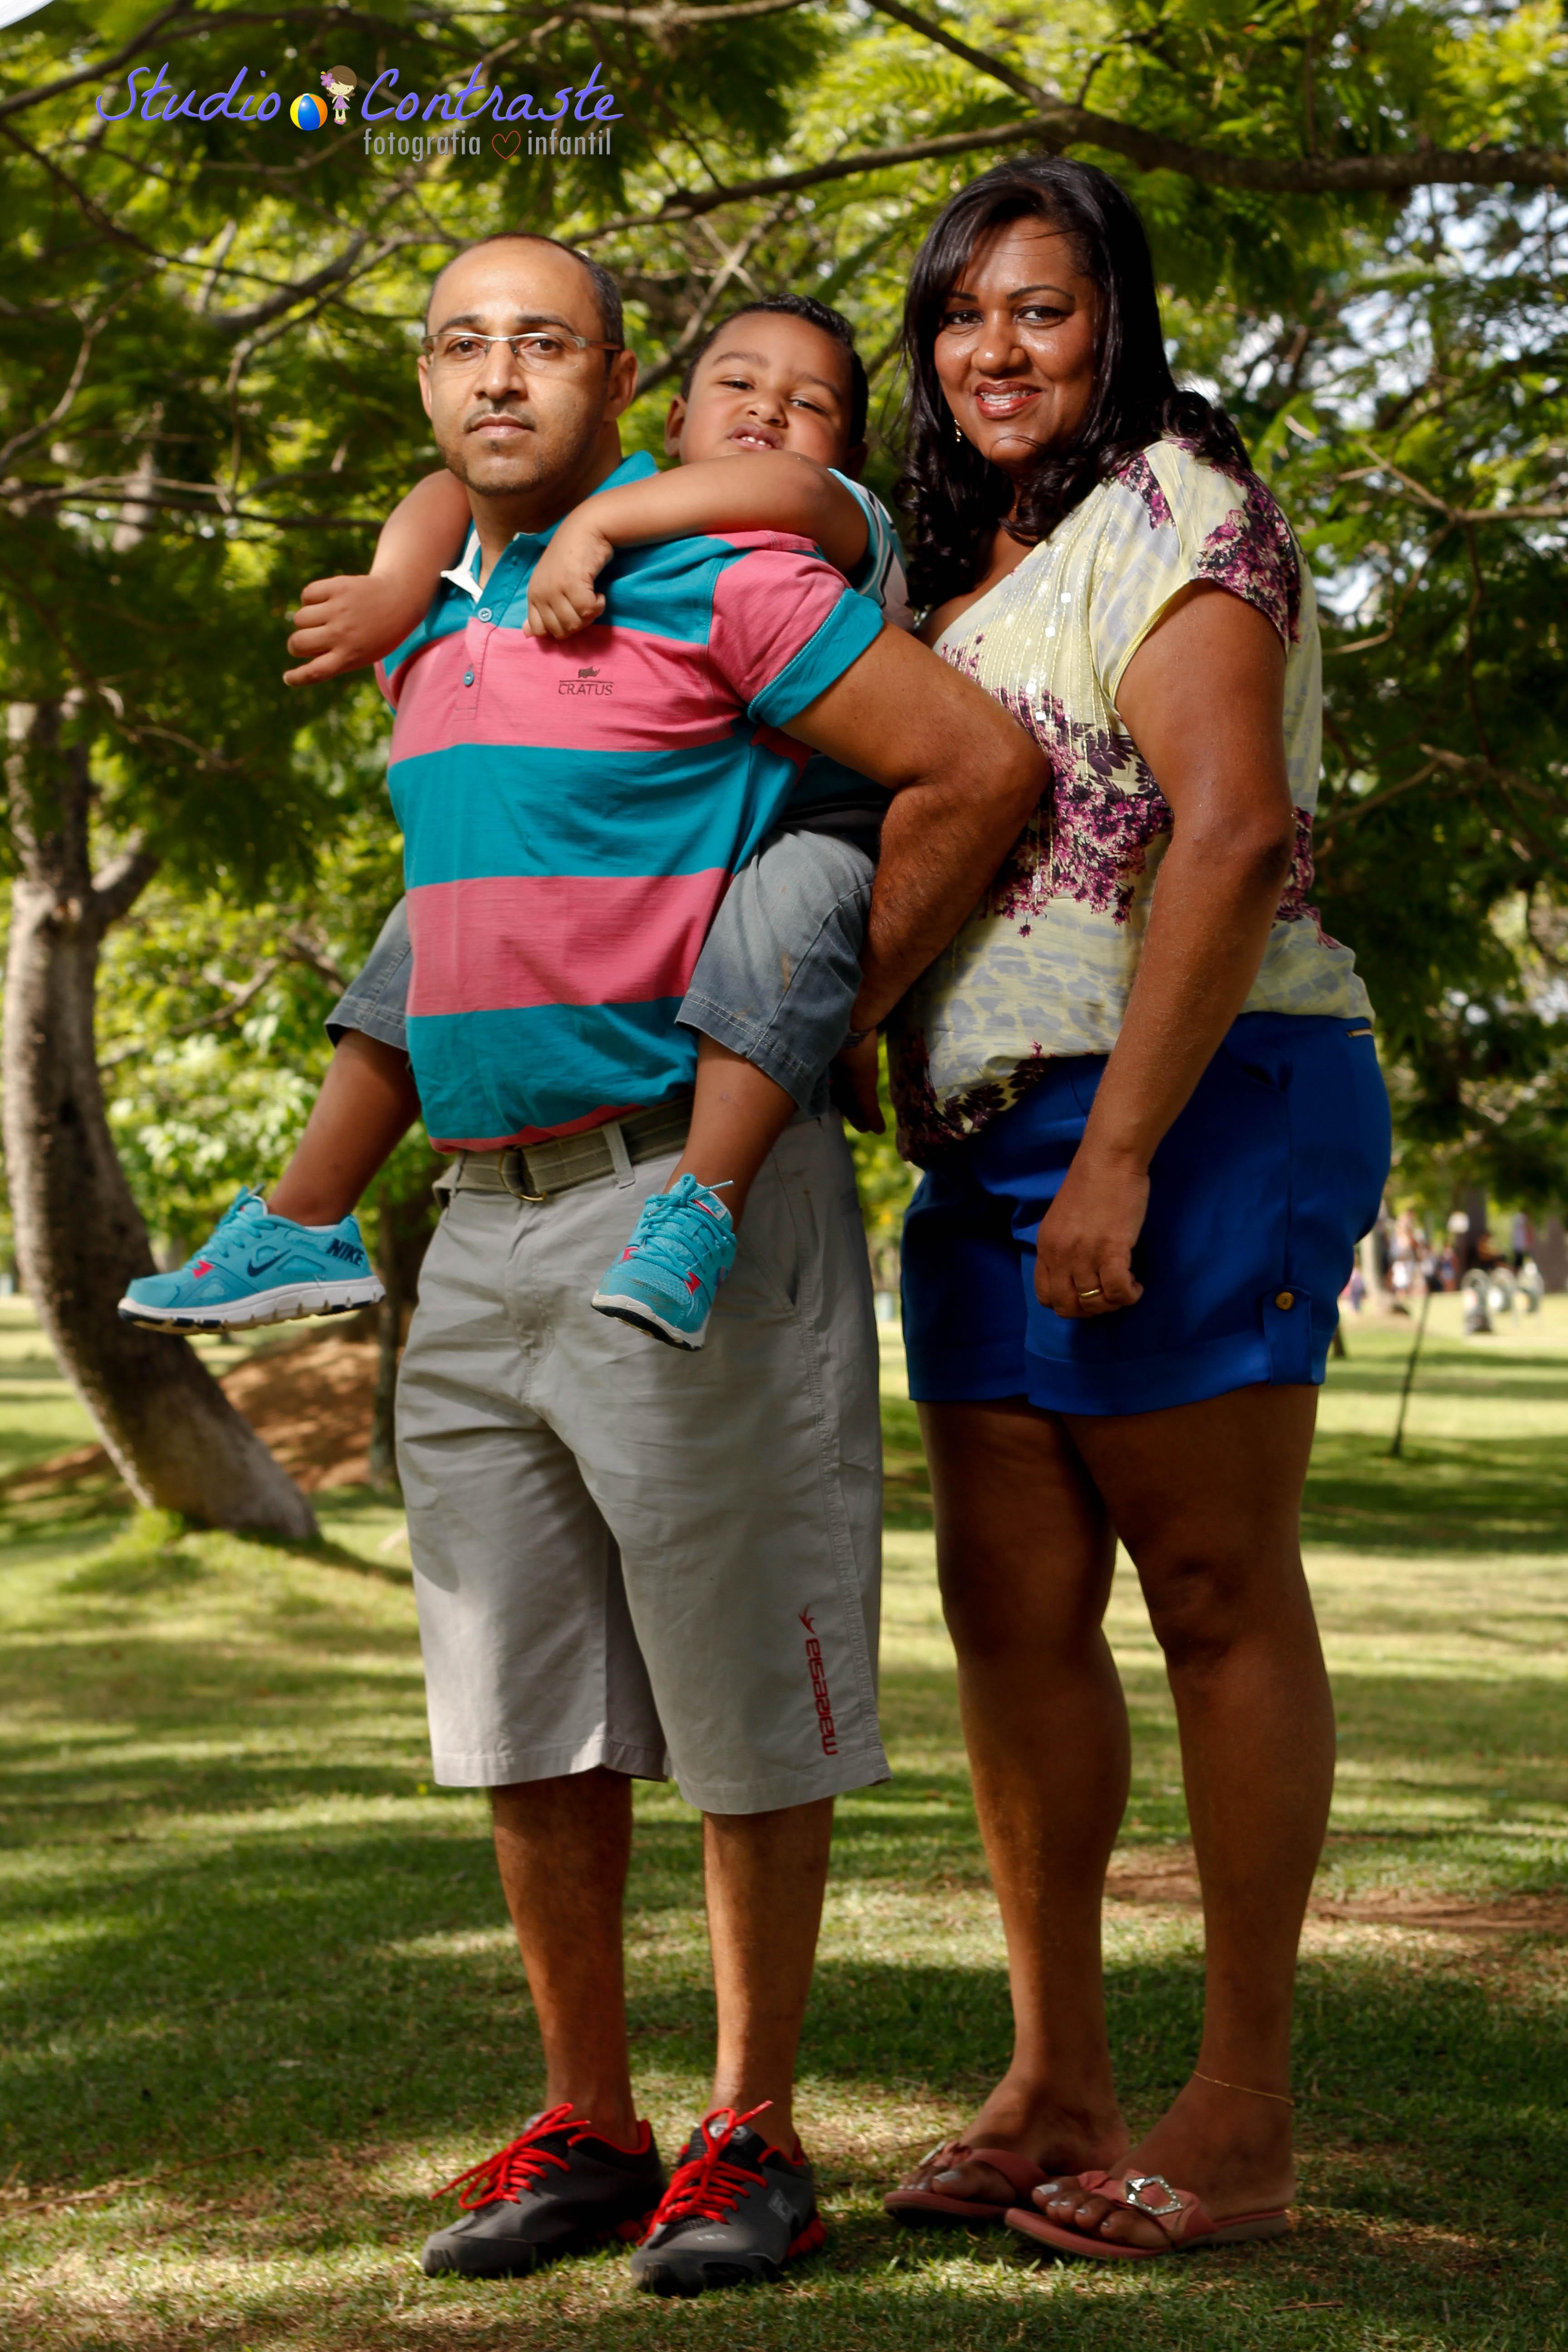 Nikollas & família